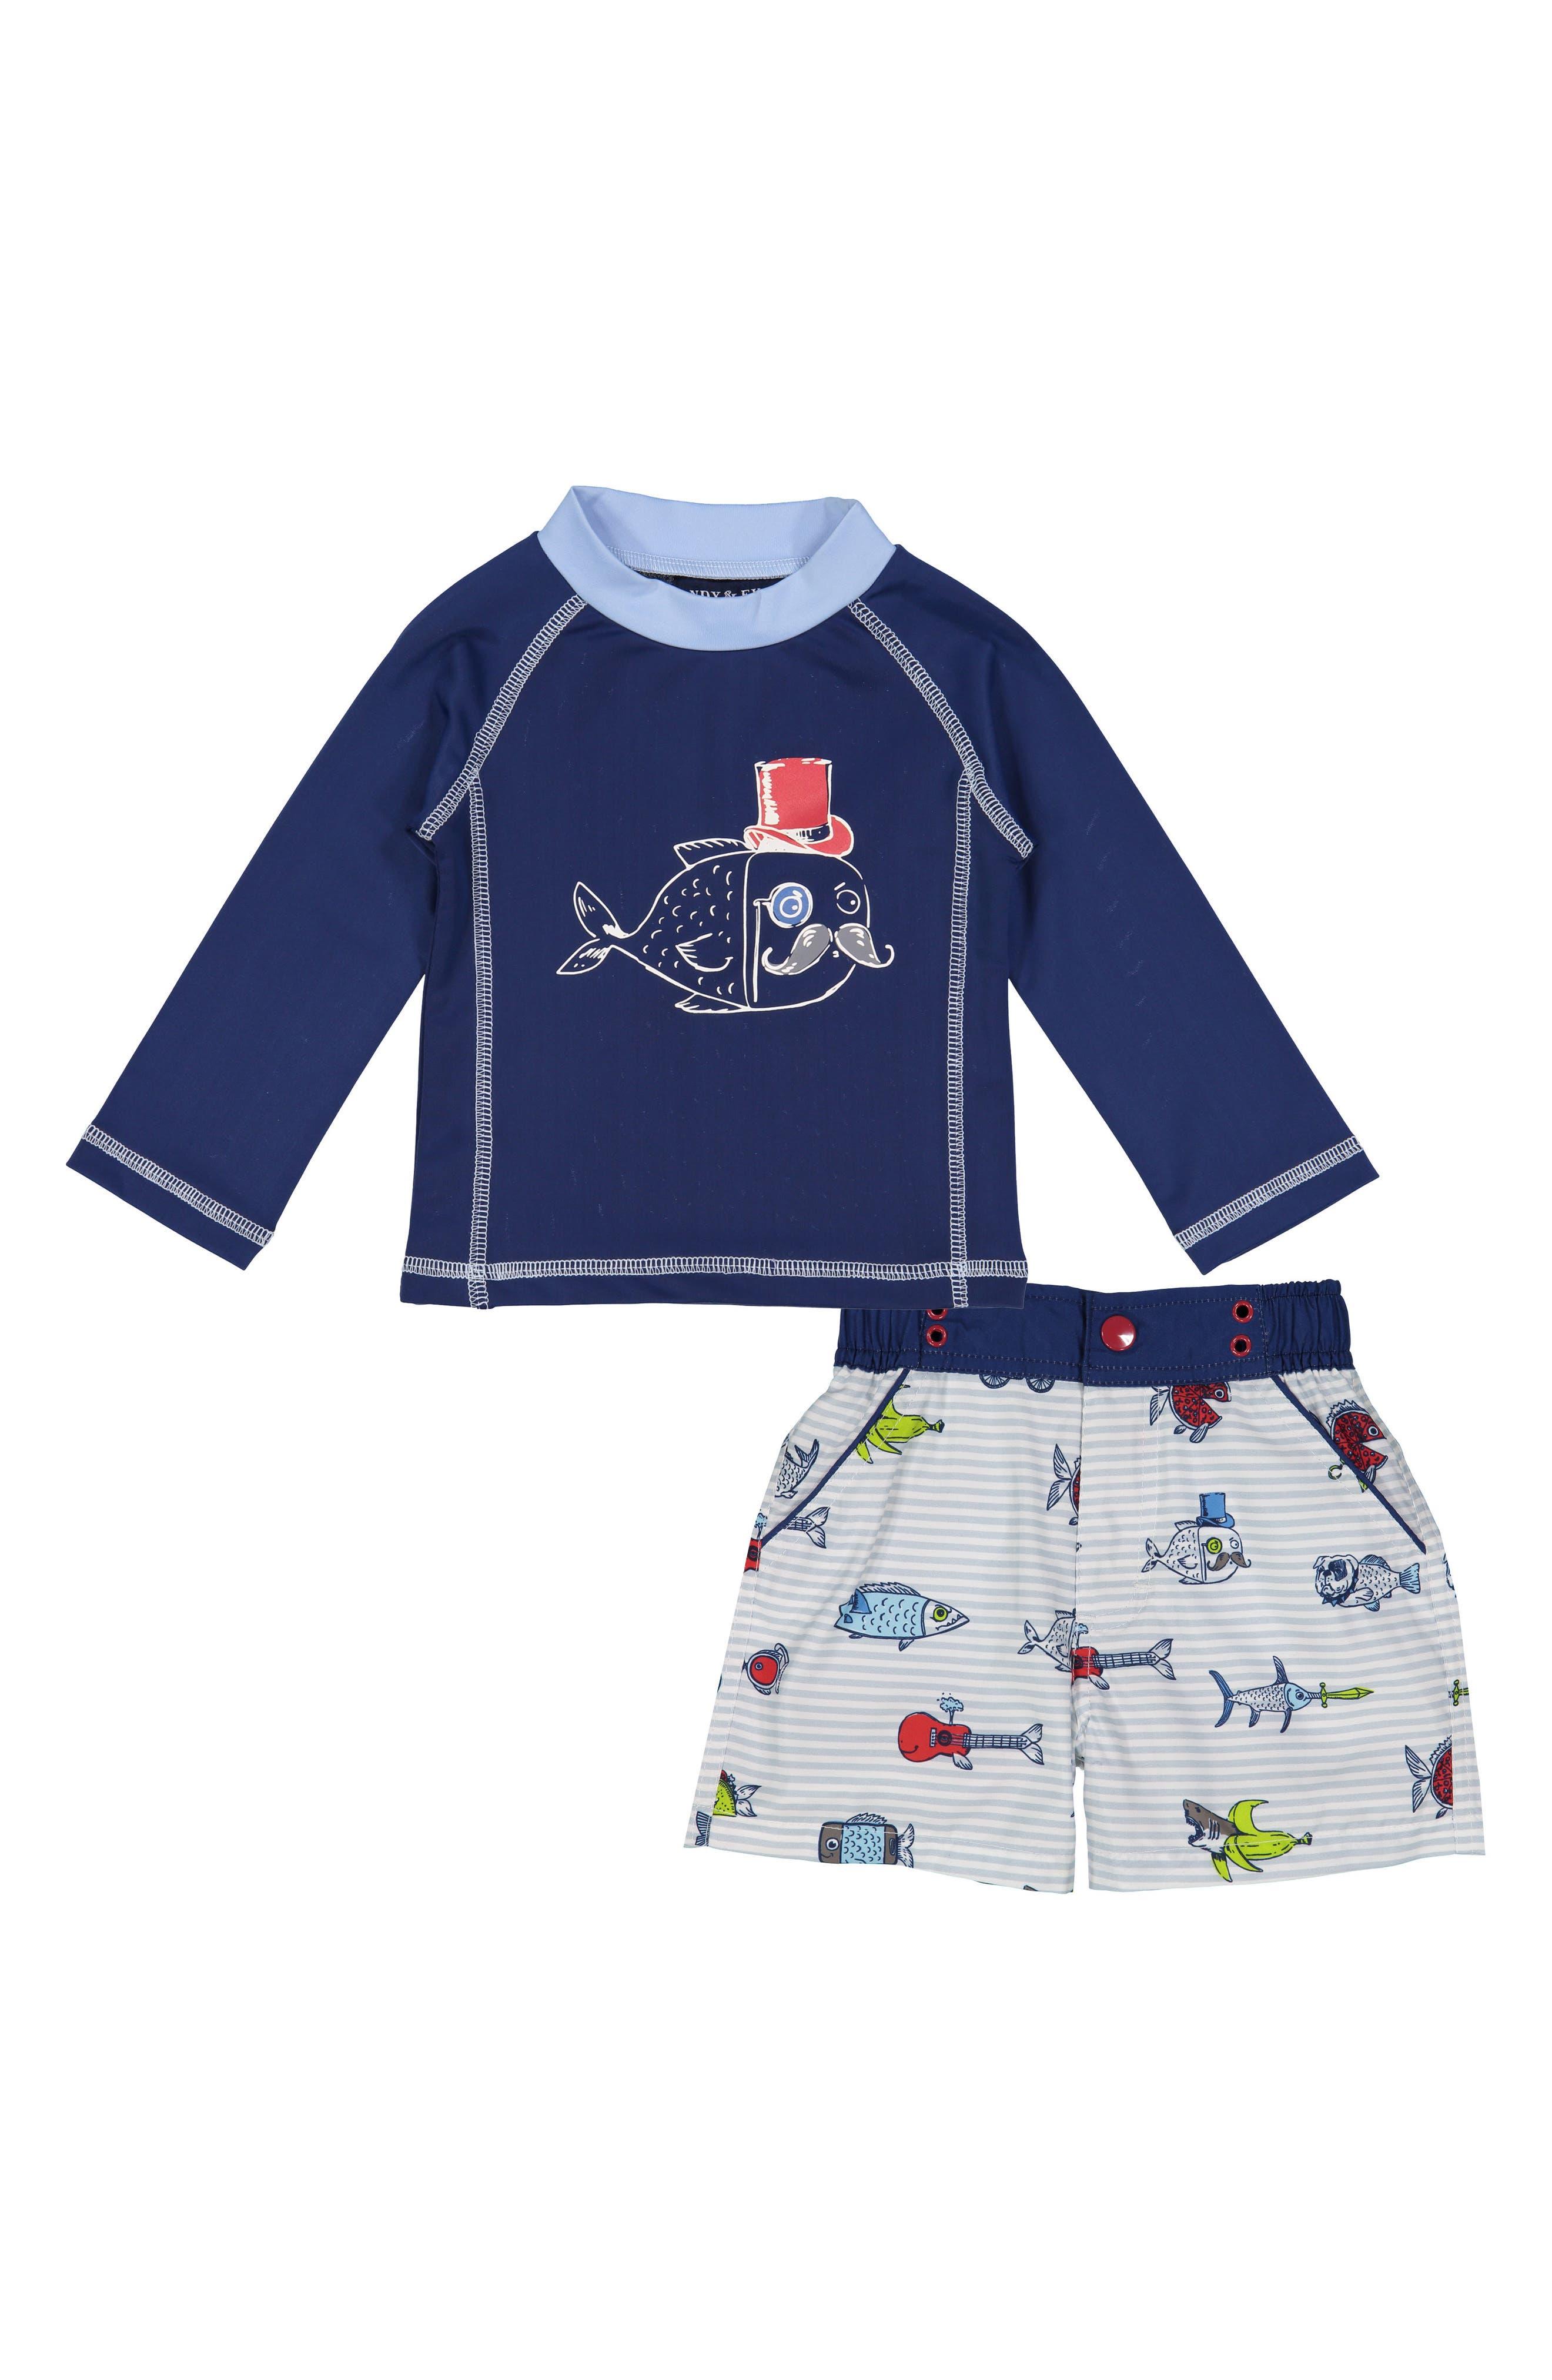 Andy & Evan Fish Two-Piece Rashguard Swimsuit (Baby Boys)